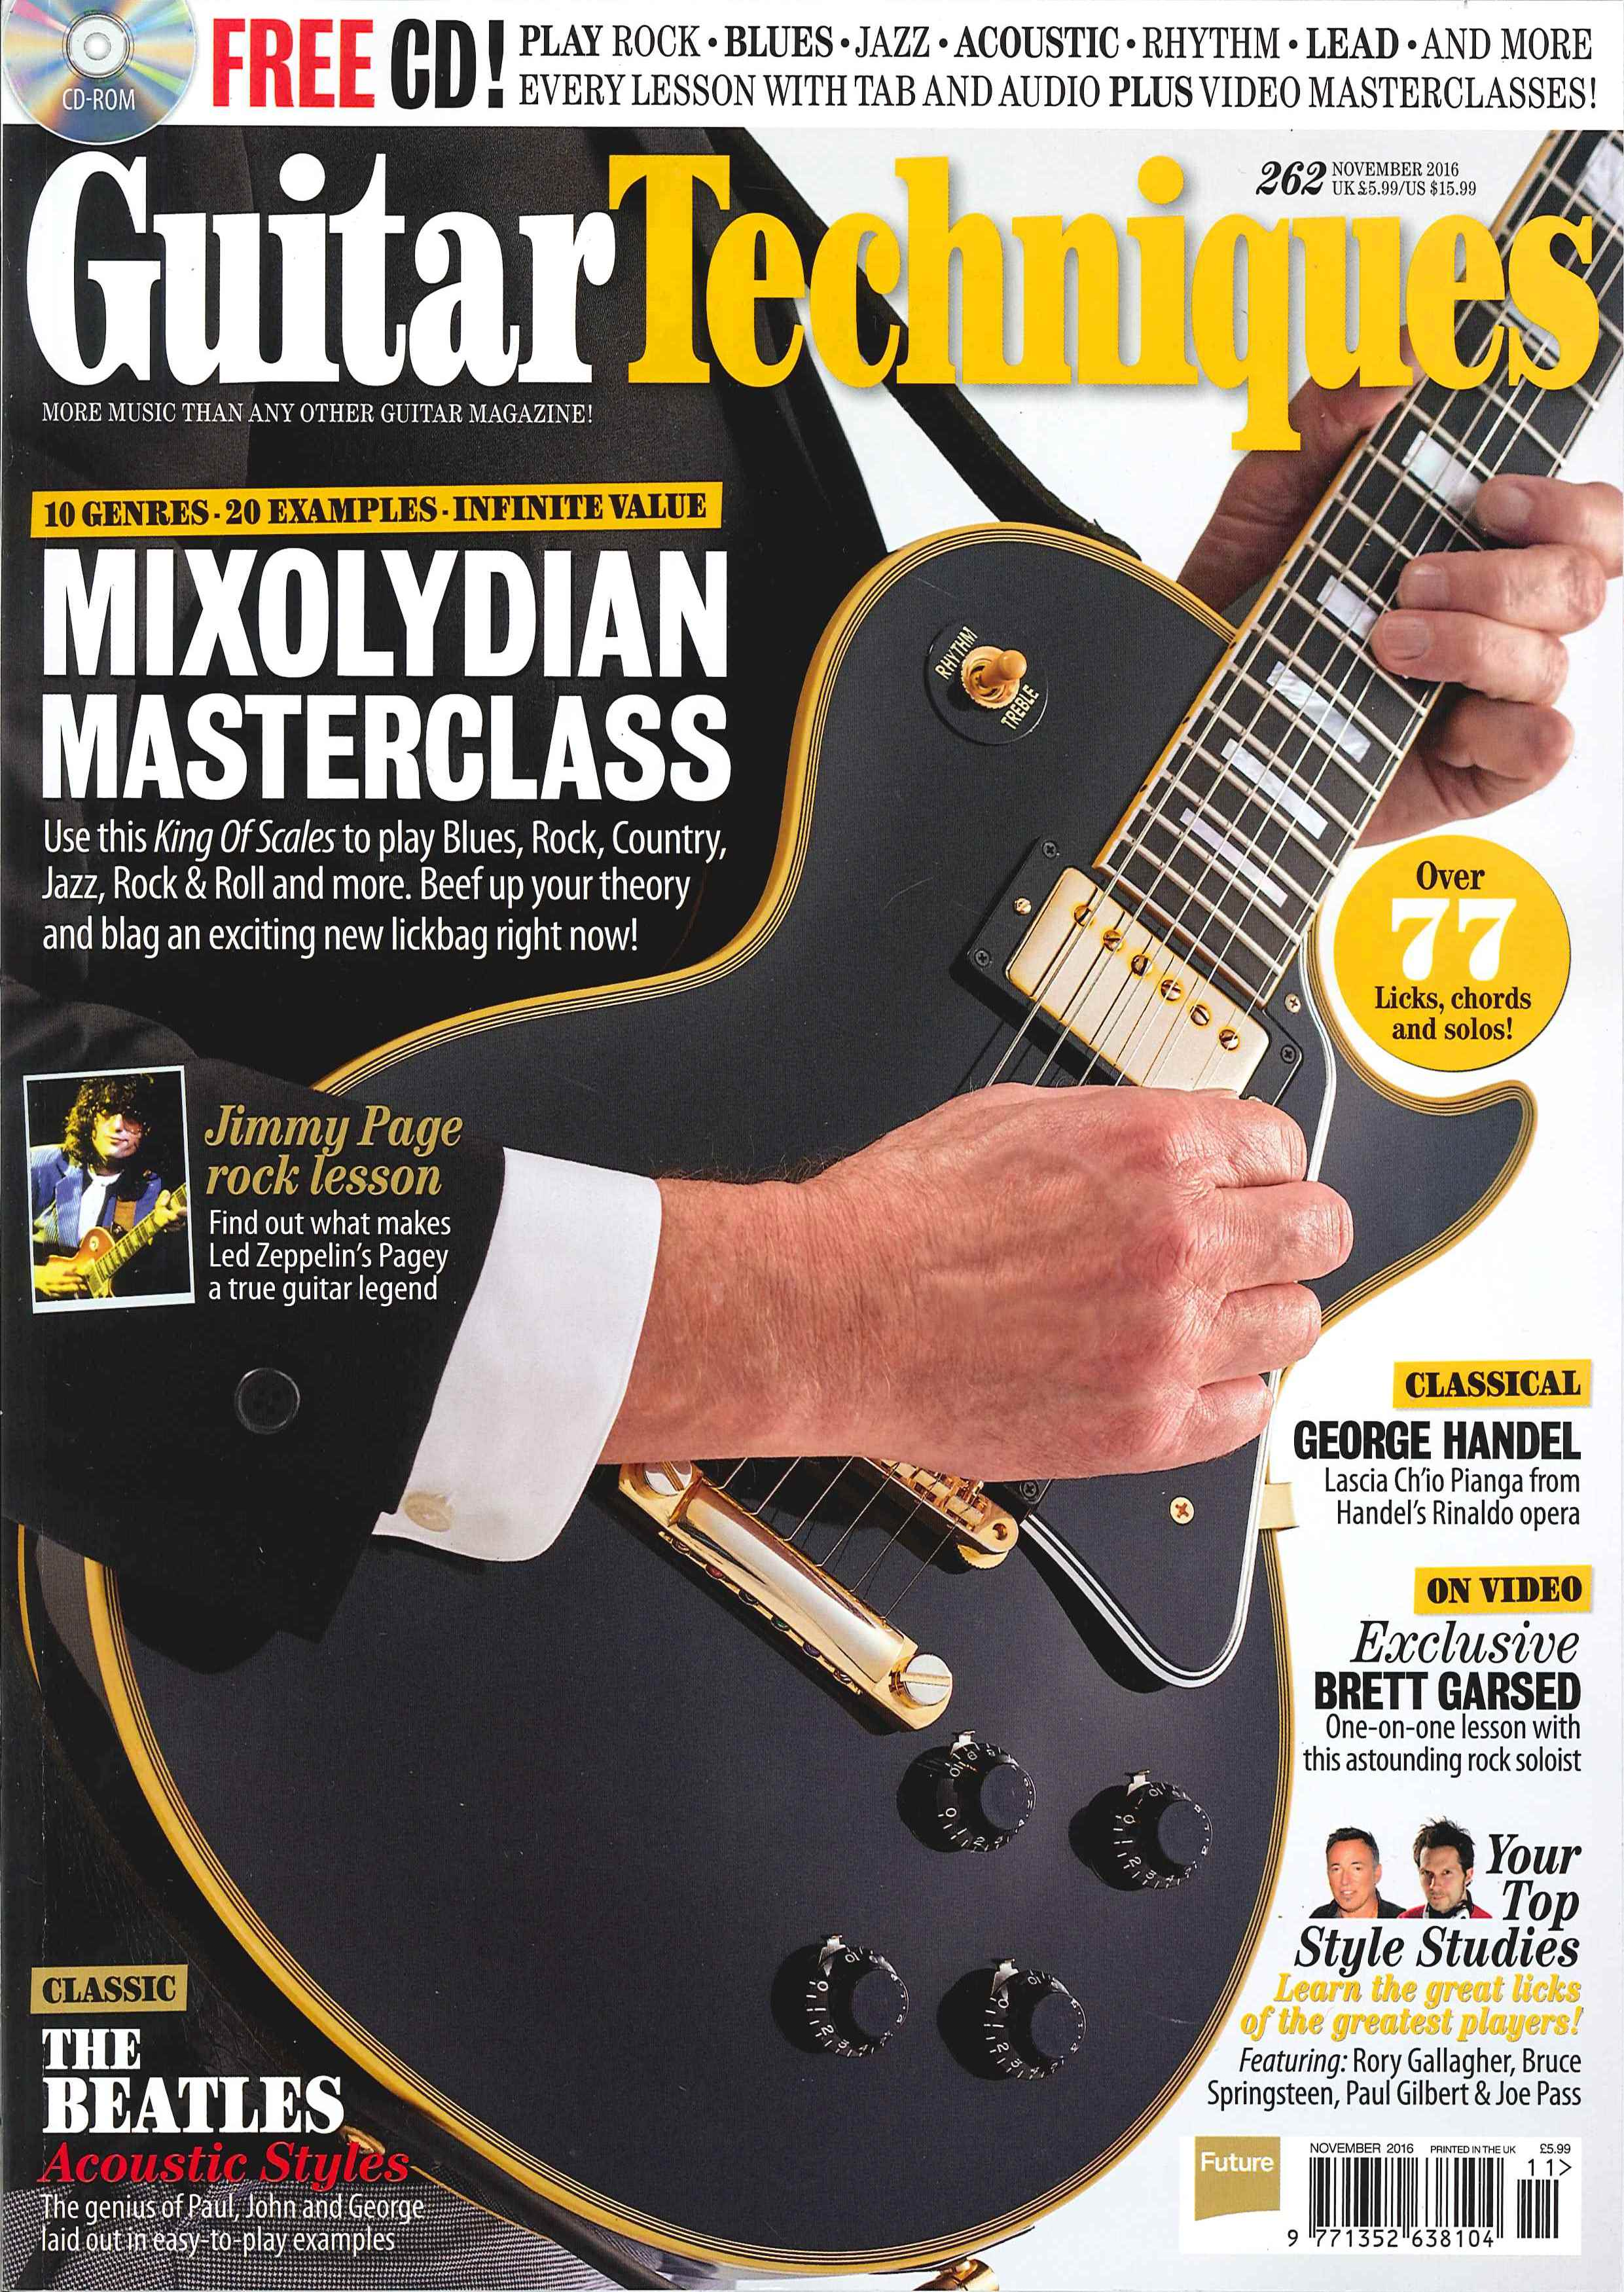 Guitar Techniques_November 2016_Sari Schorr_album review_1.jpg